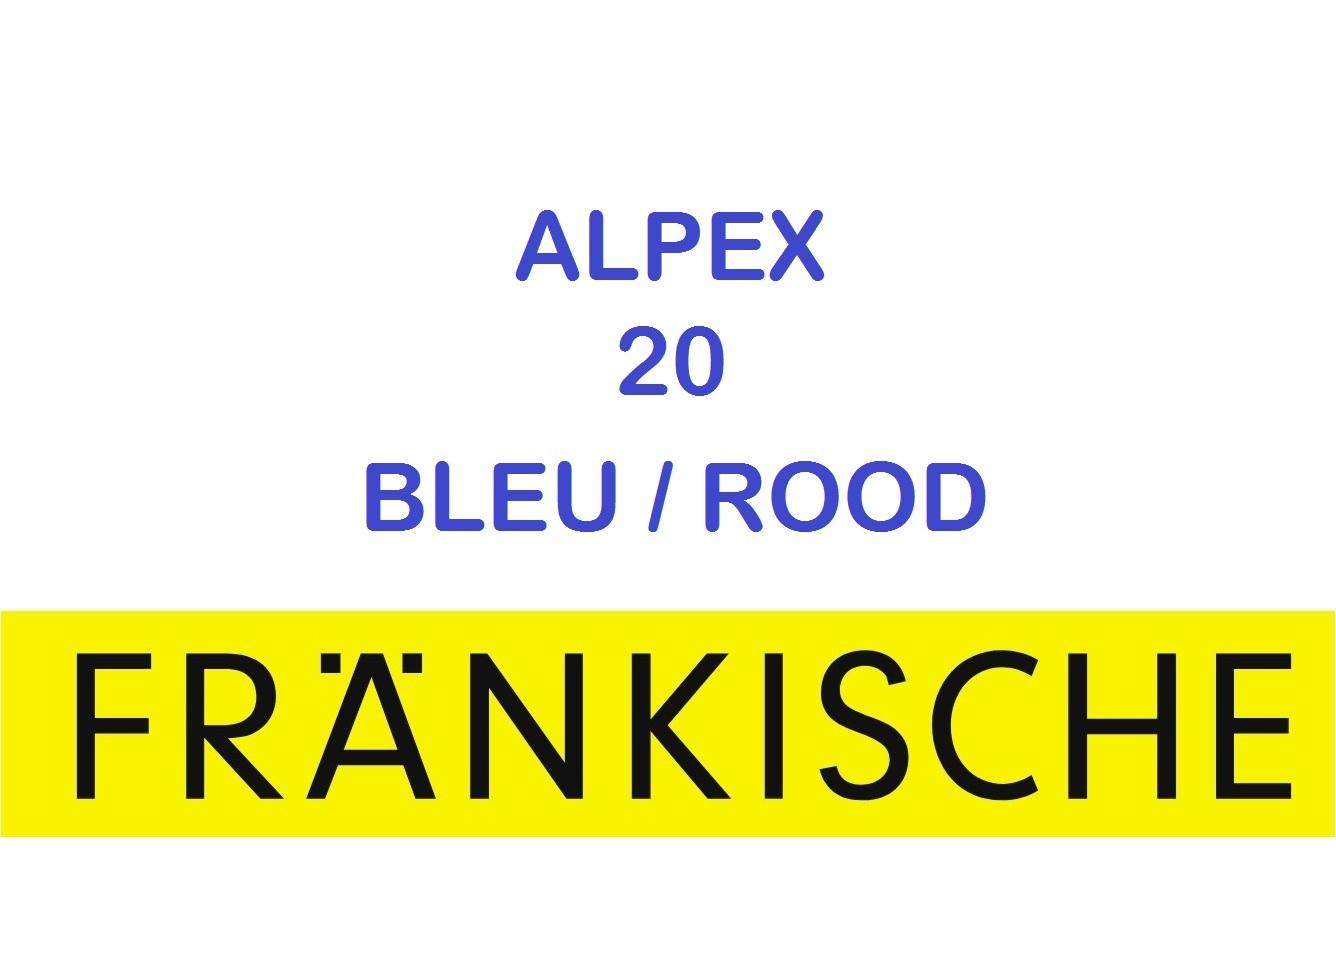 Multicouche Alpex 20x2 50 m GAINE BLEU